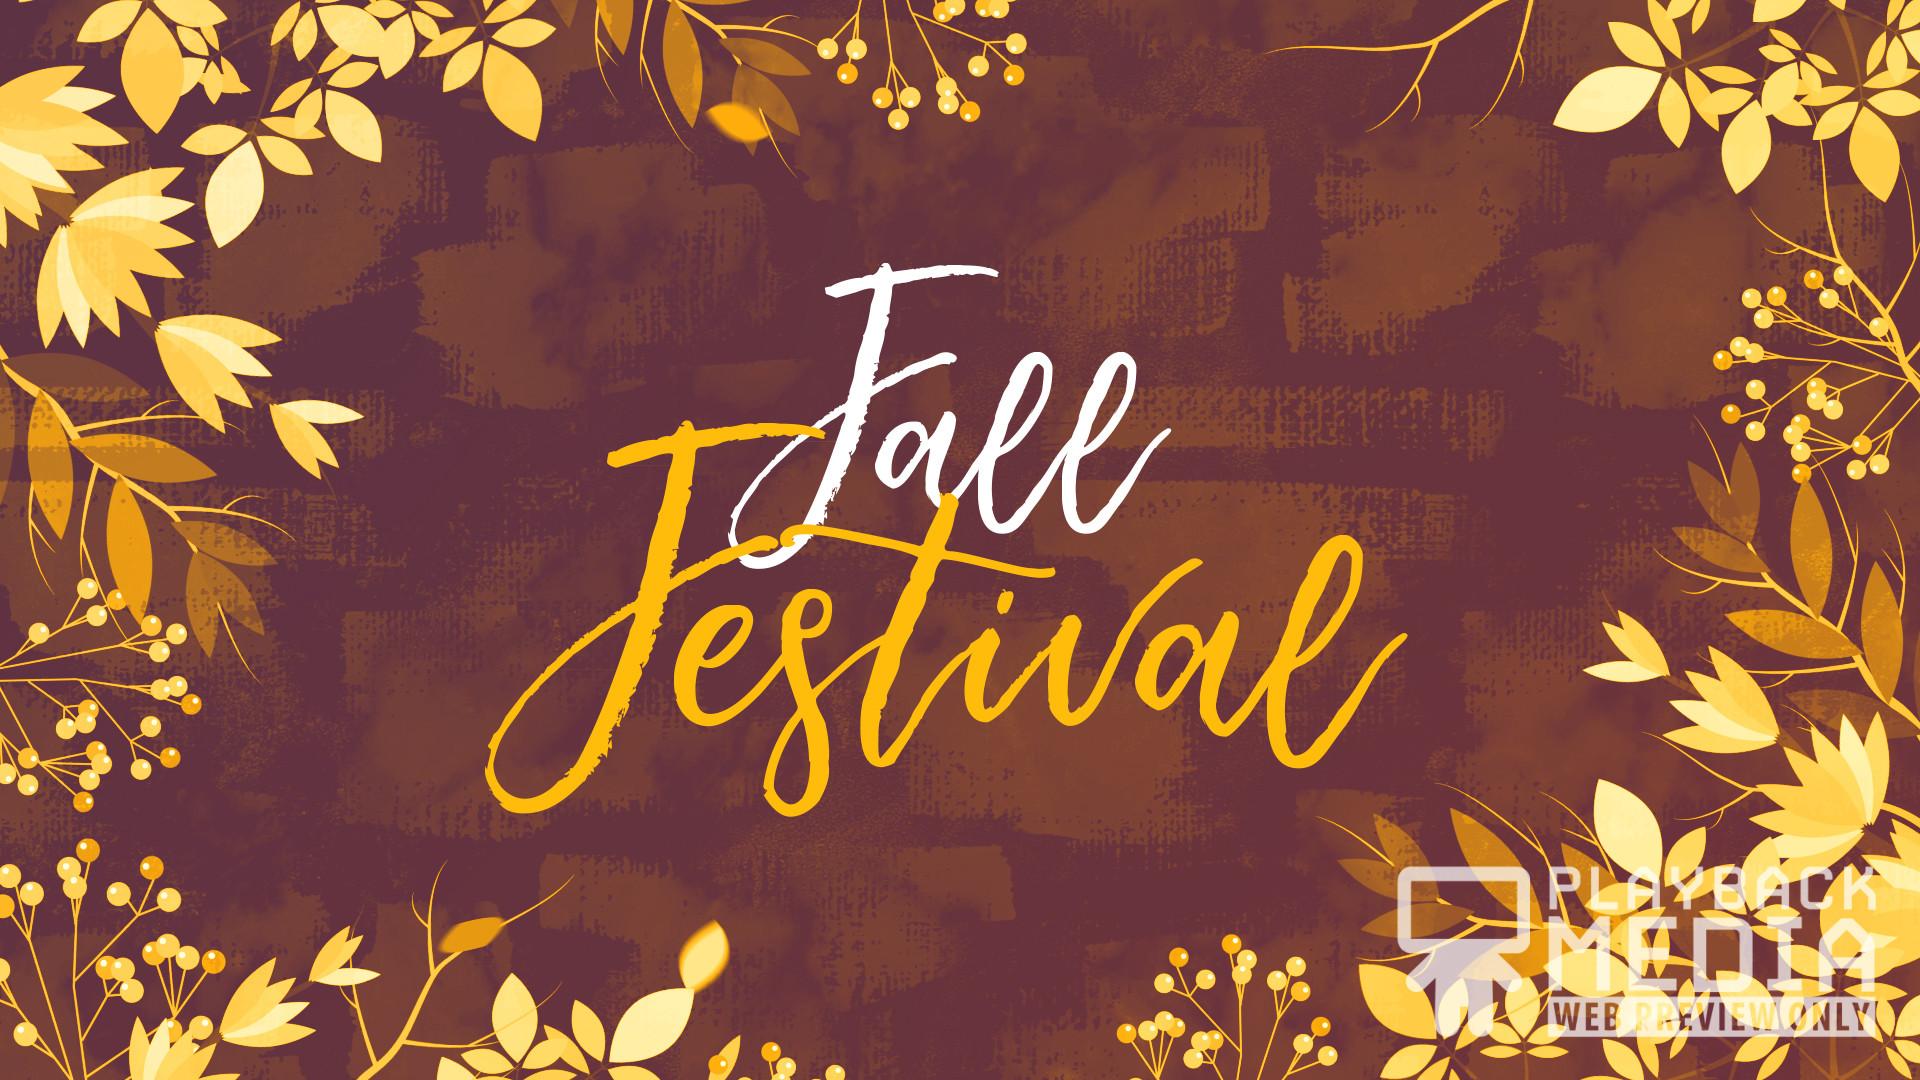 Res: 1920x1080, Autumn Breeze Fall Festival Still